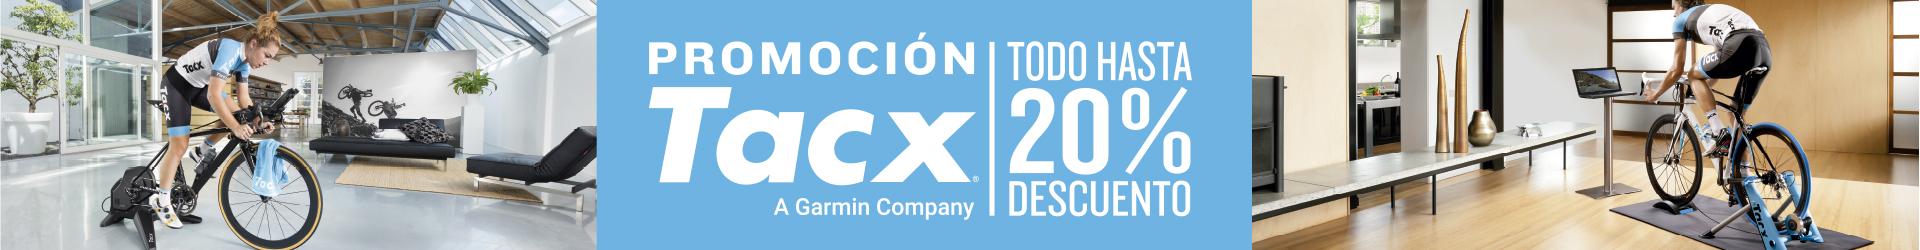 ofertas Tacx